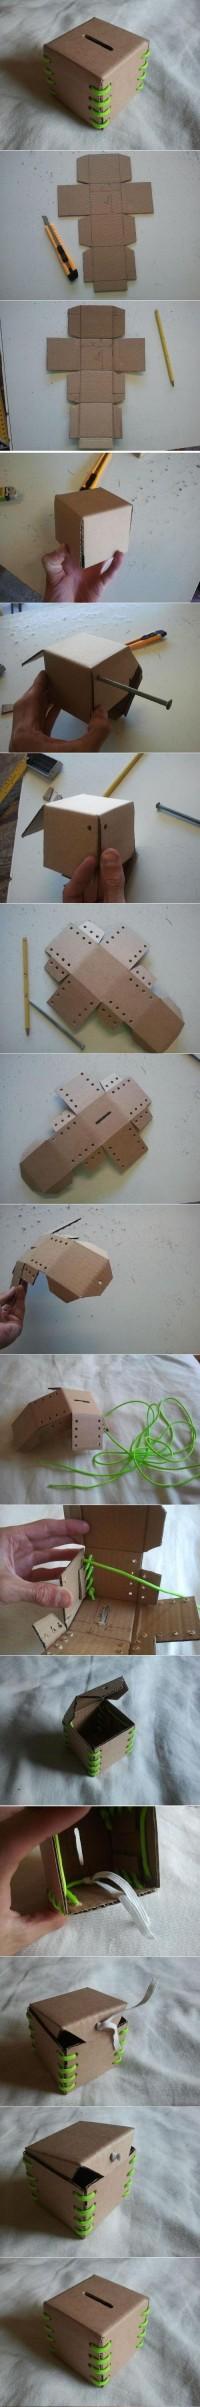 DIY Cardboard Piggy Bank DIY Projects | UsefulDIY.com